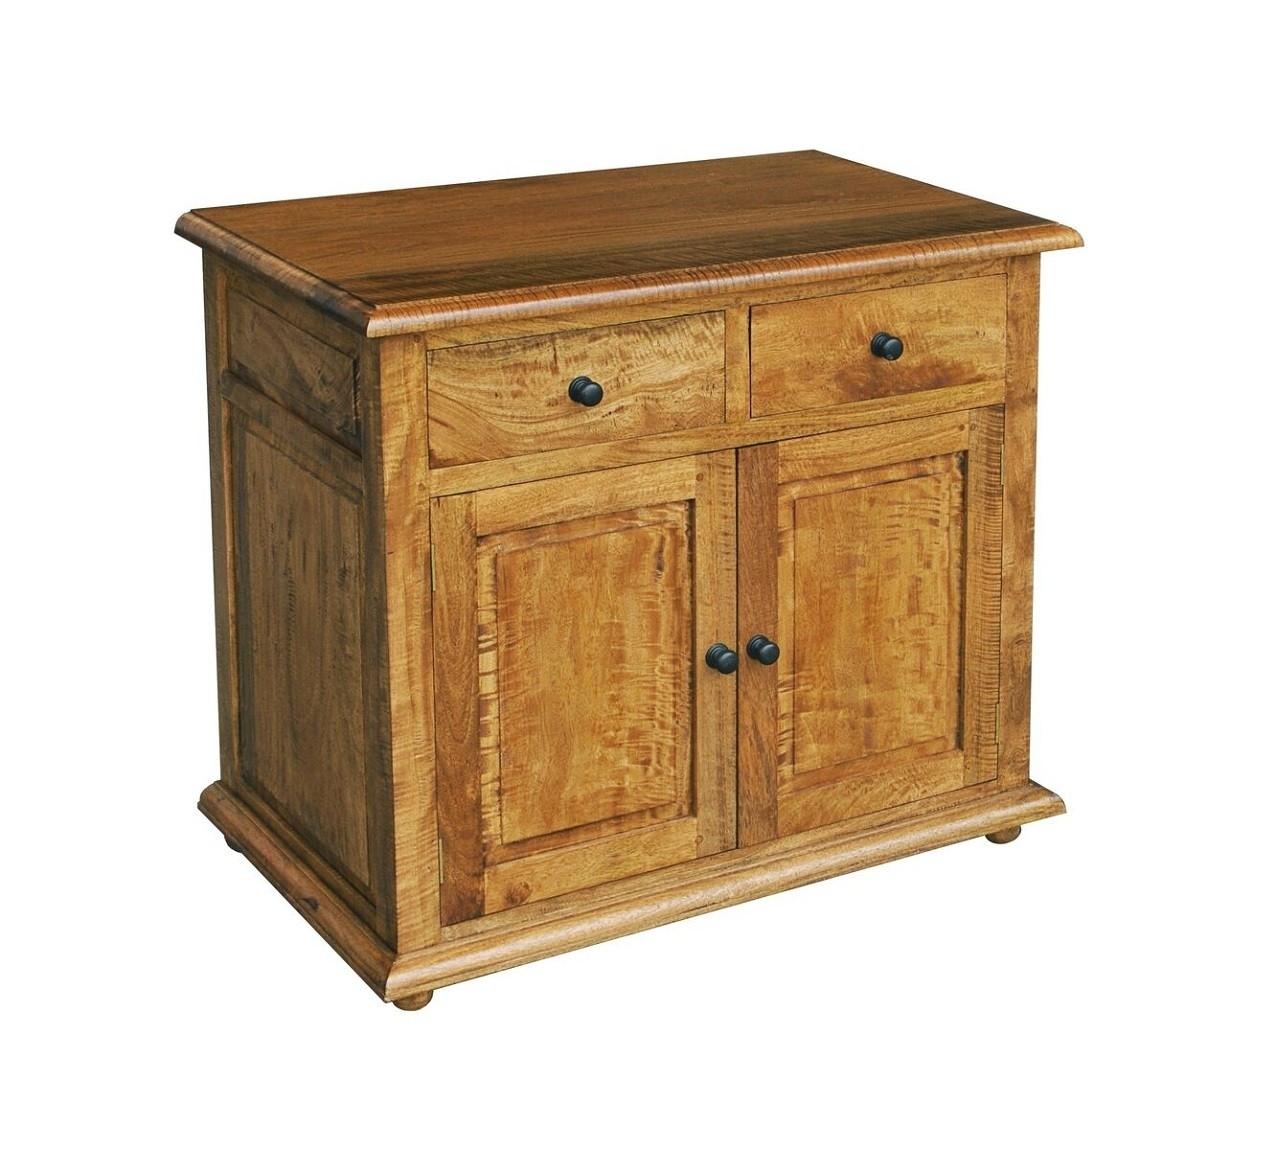 Asian Solid Mango Wood Small 2 Door Sideboard | Oak Furniture Uk throughout Mango Wood 2-Door/2-Drawer Sideboards (Image 4 of 30)